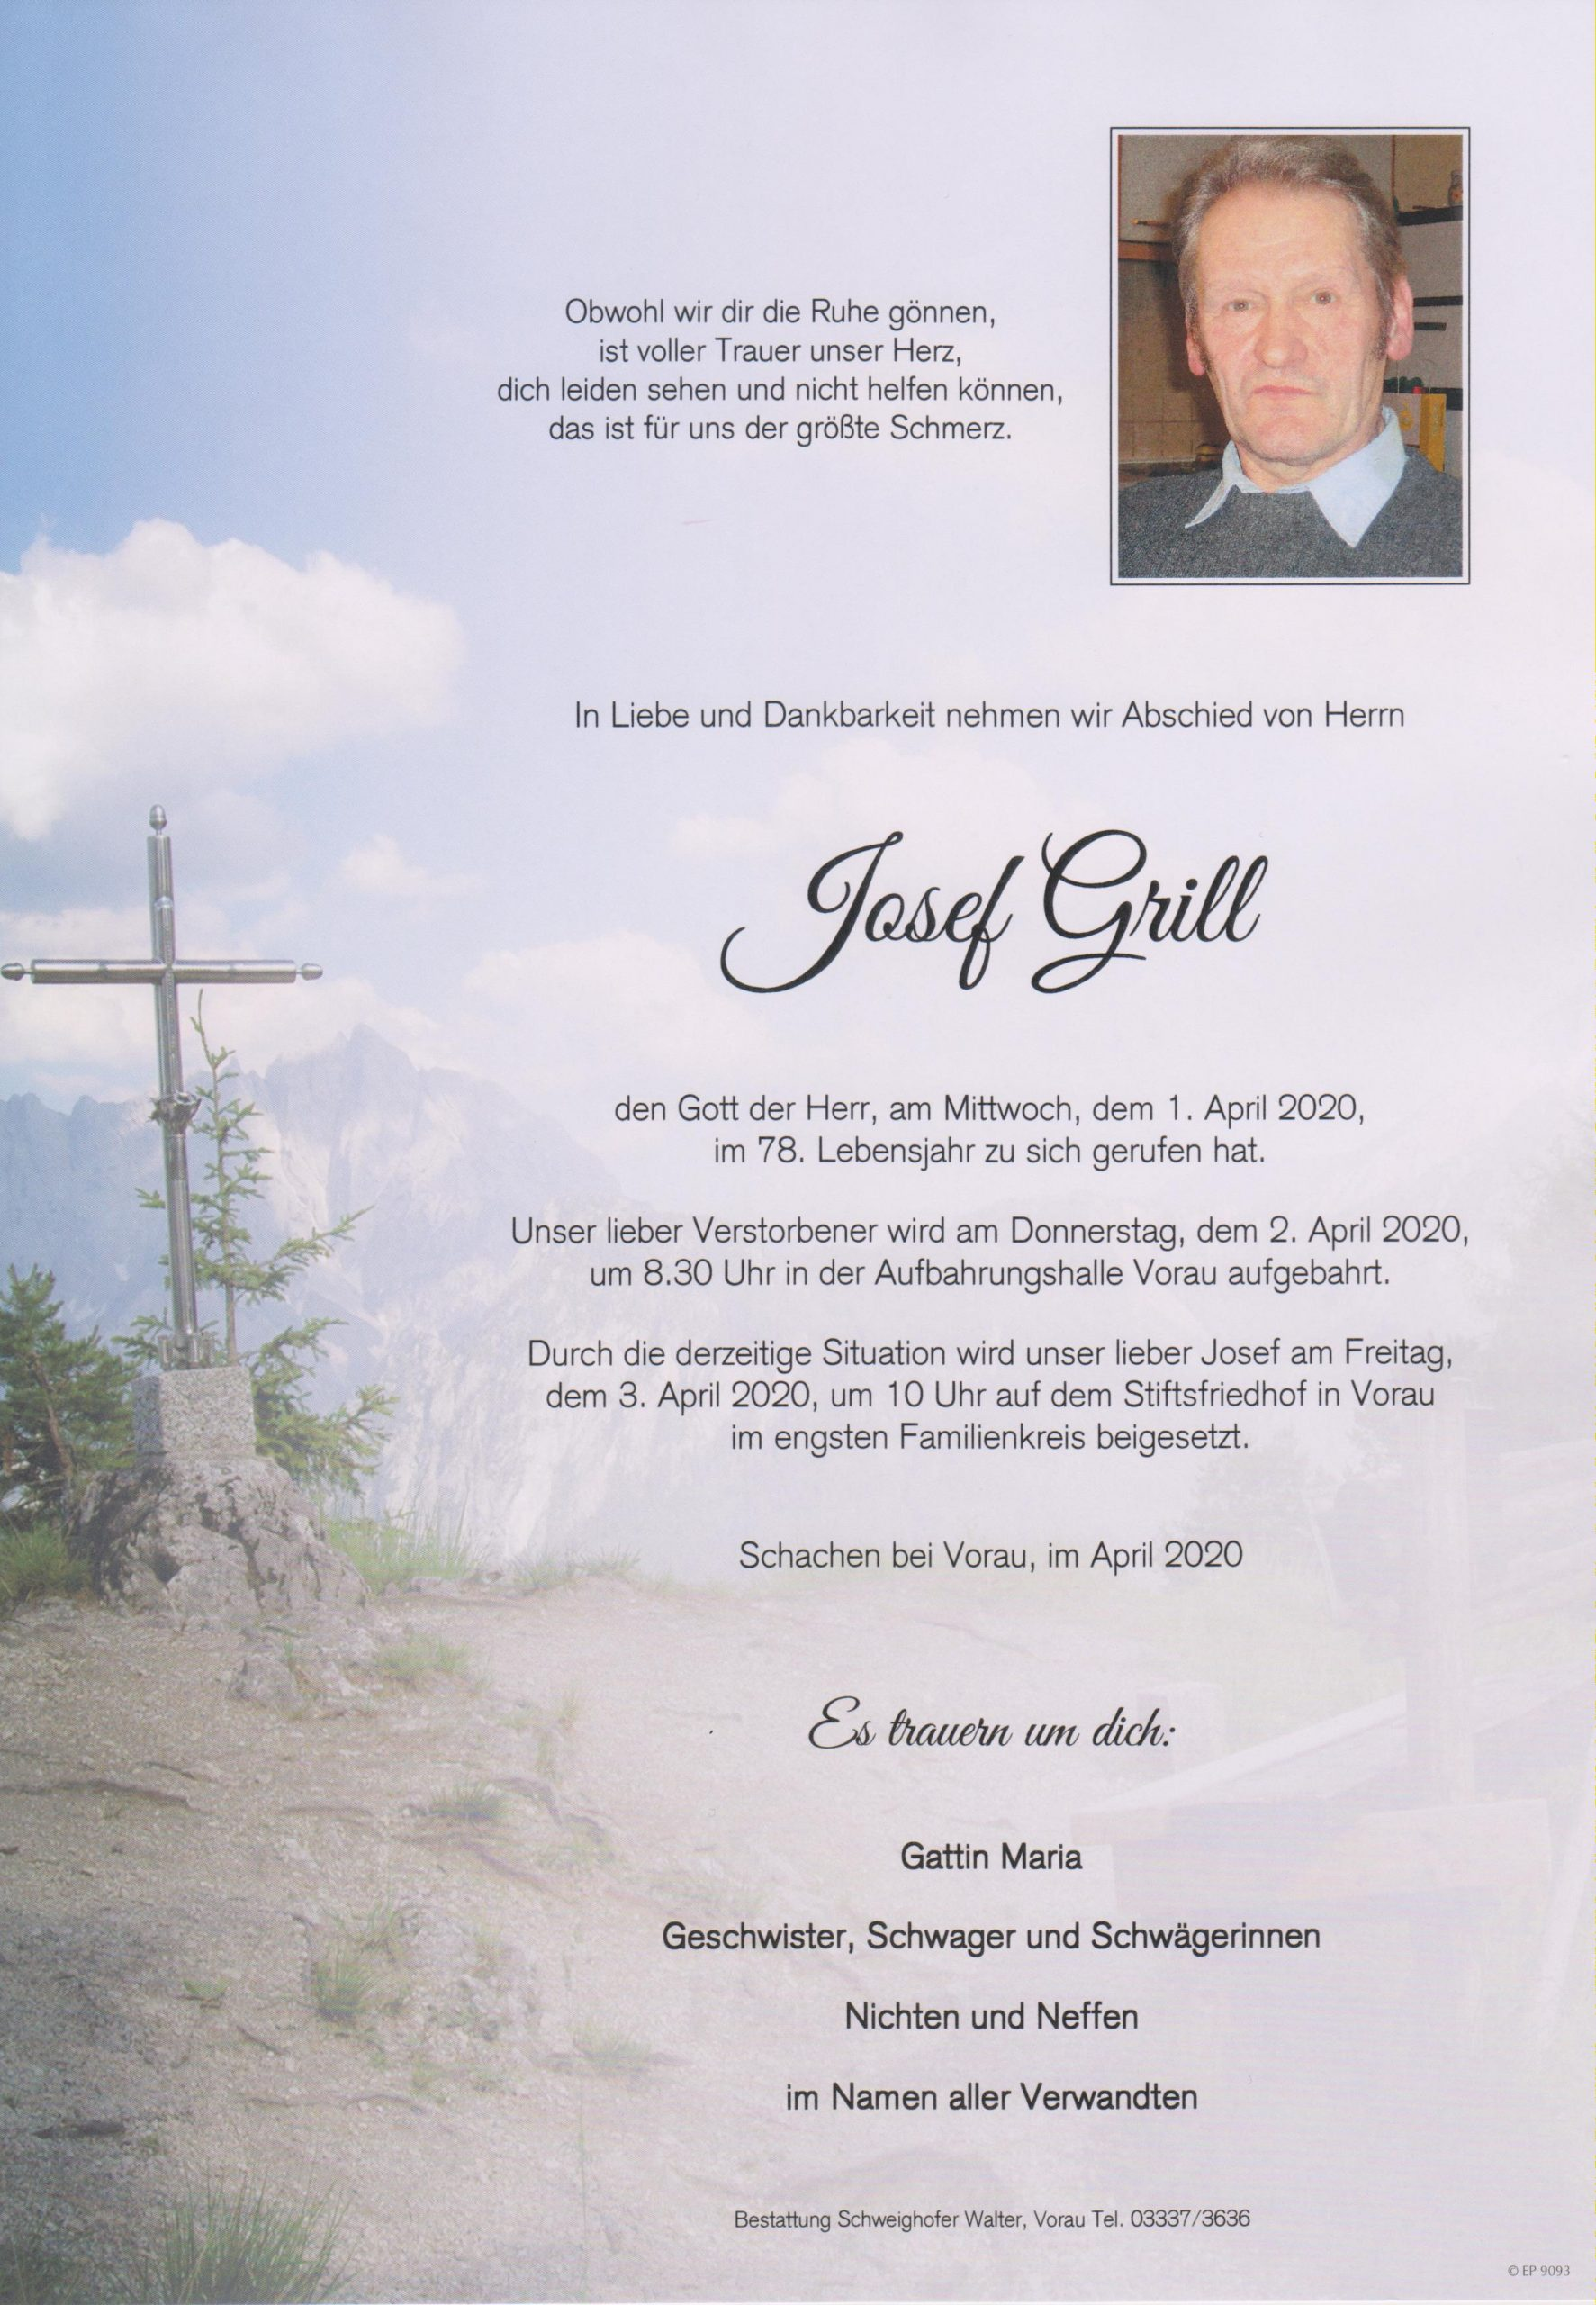 Josef Grill